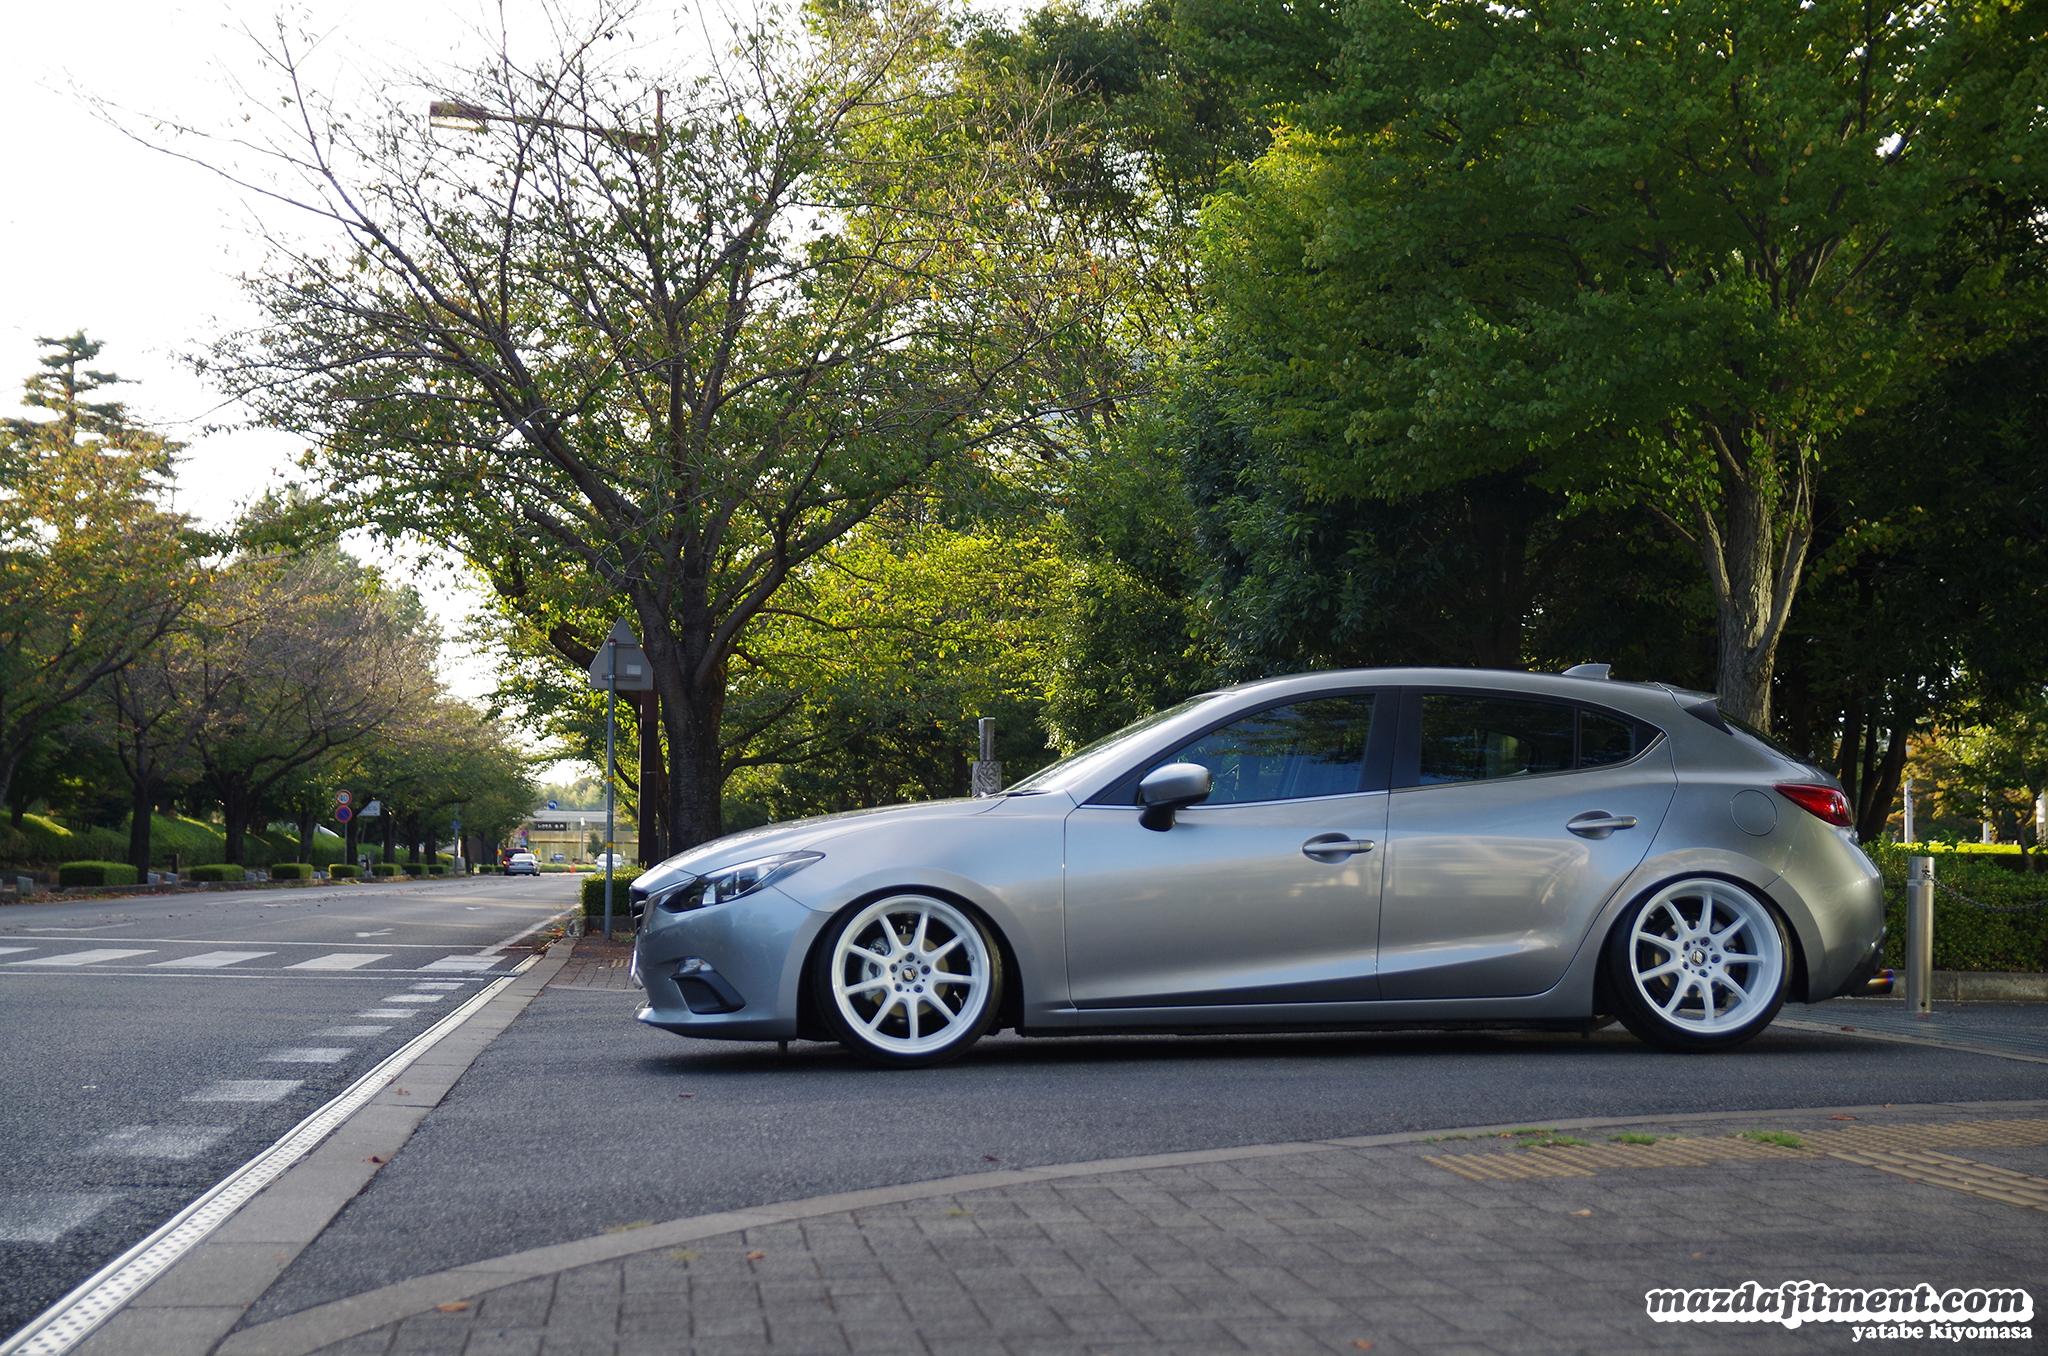 The Next Generation – Mazda Fitment 2014 Mazda 3 Wheels